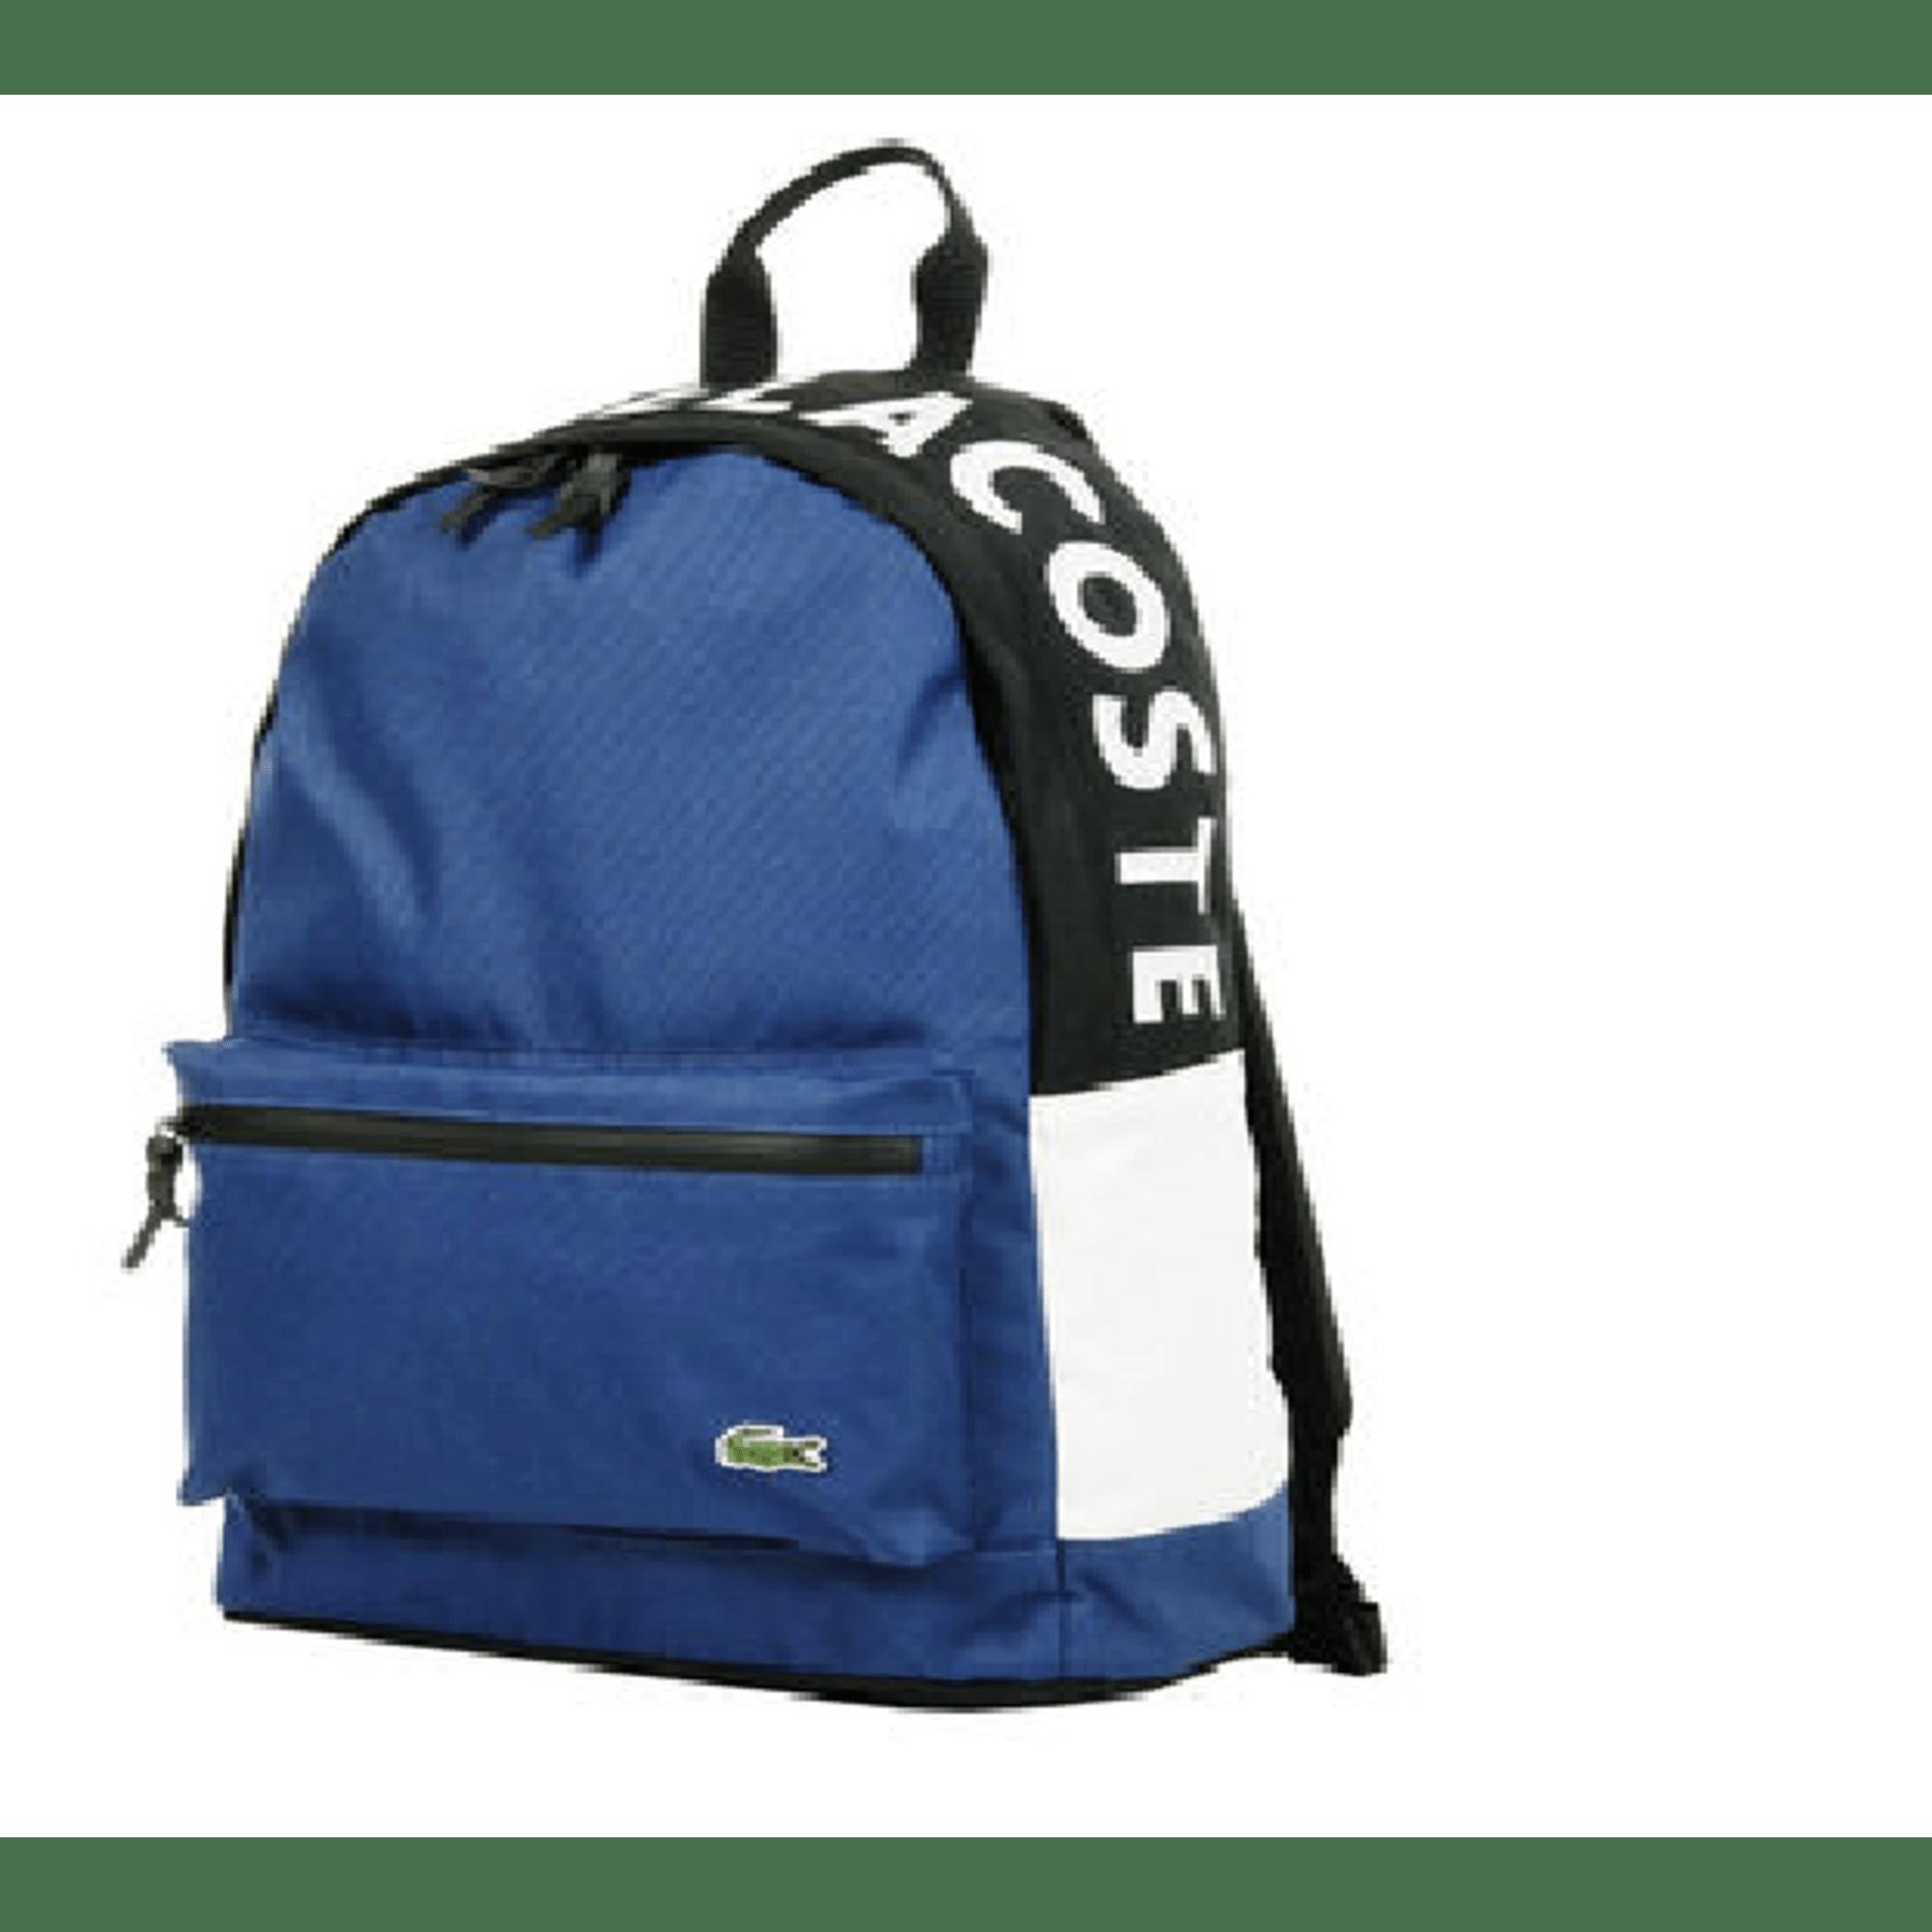 3710ebe718 Sac à dos LACOSTE Bleu, bleu marine, bleu turquoise